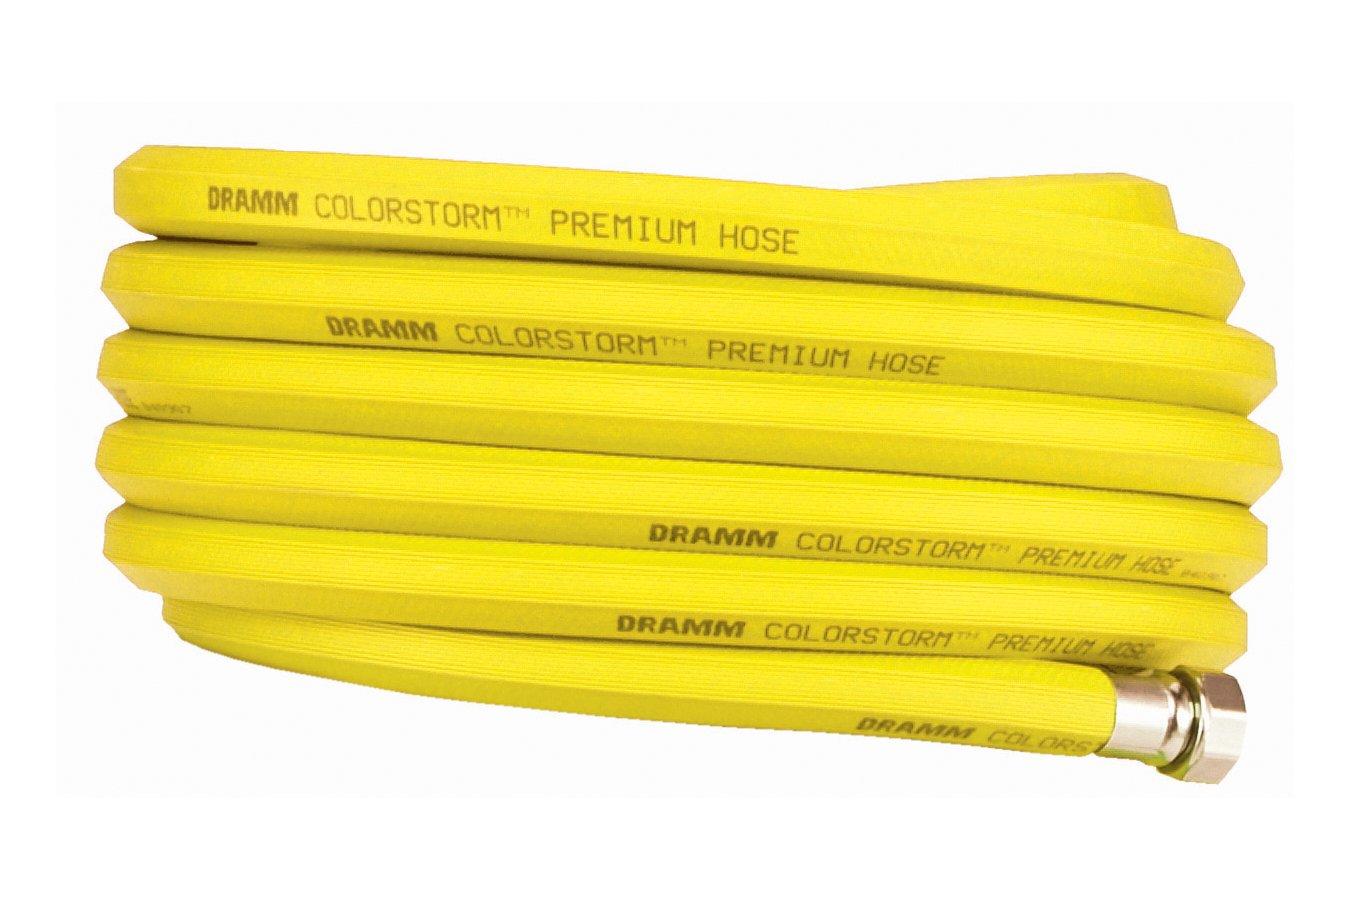 Dramm 17313 ColorStorm Premium Rubber Hose, 3/4'' x 100', Yellow